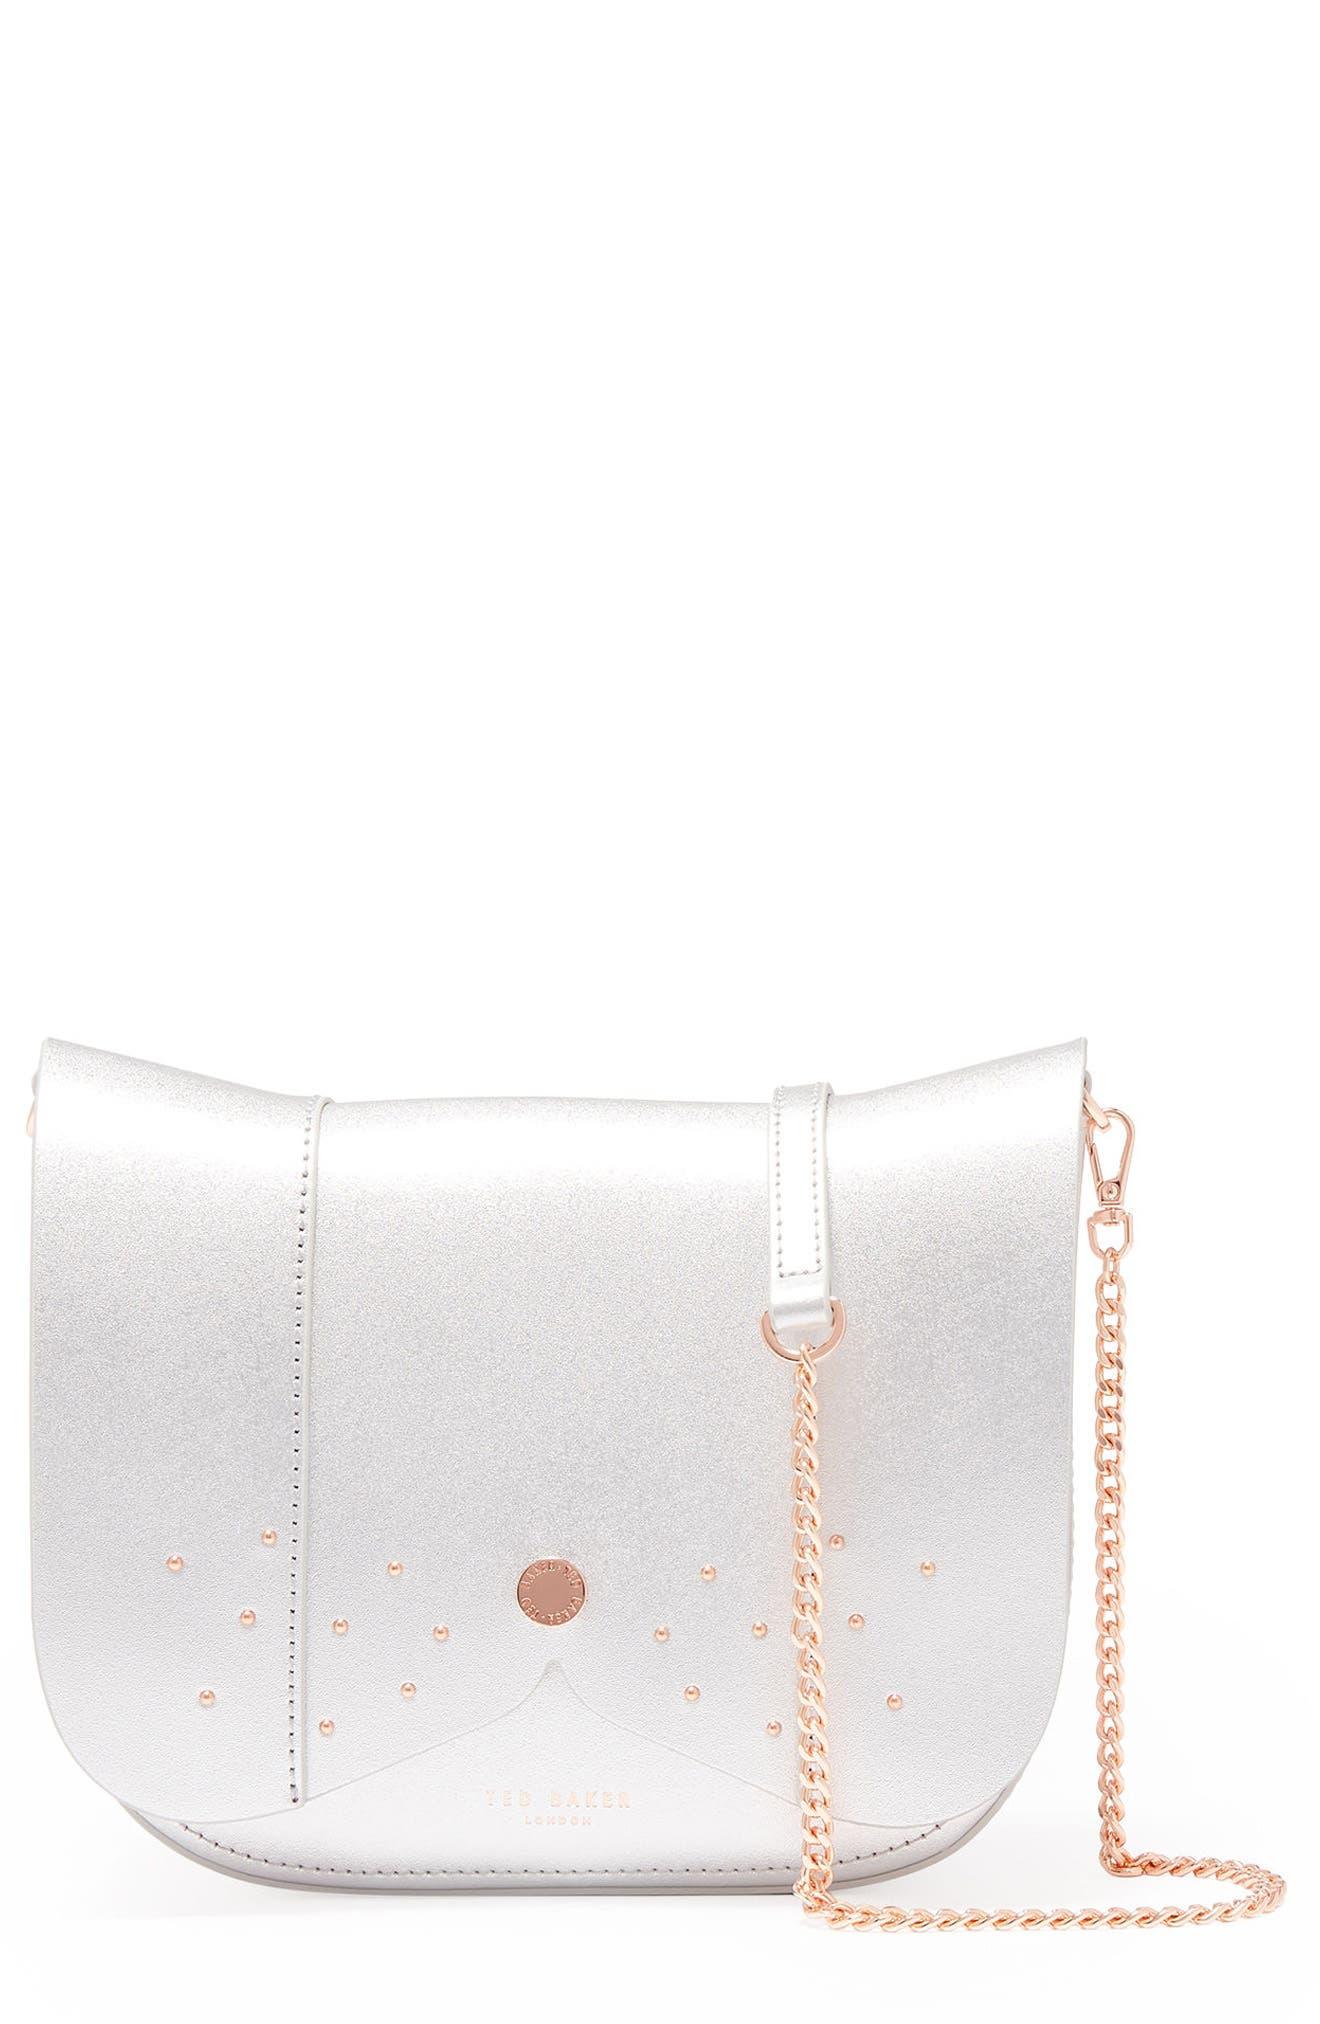 Barkley Dog Leather Crossbody Bag,                         Main,                         color, 020